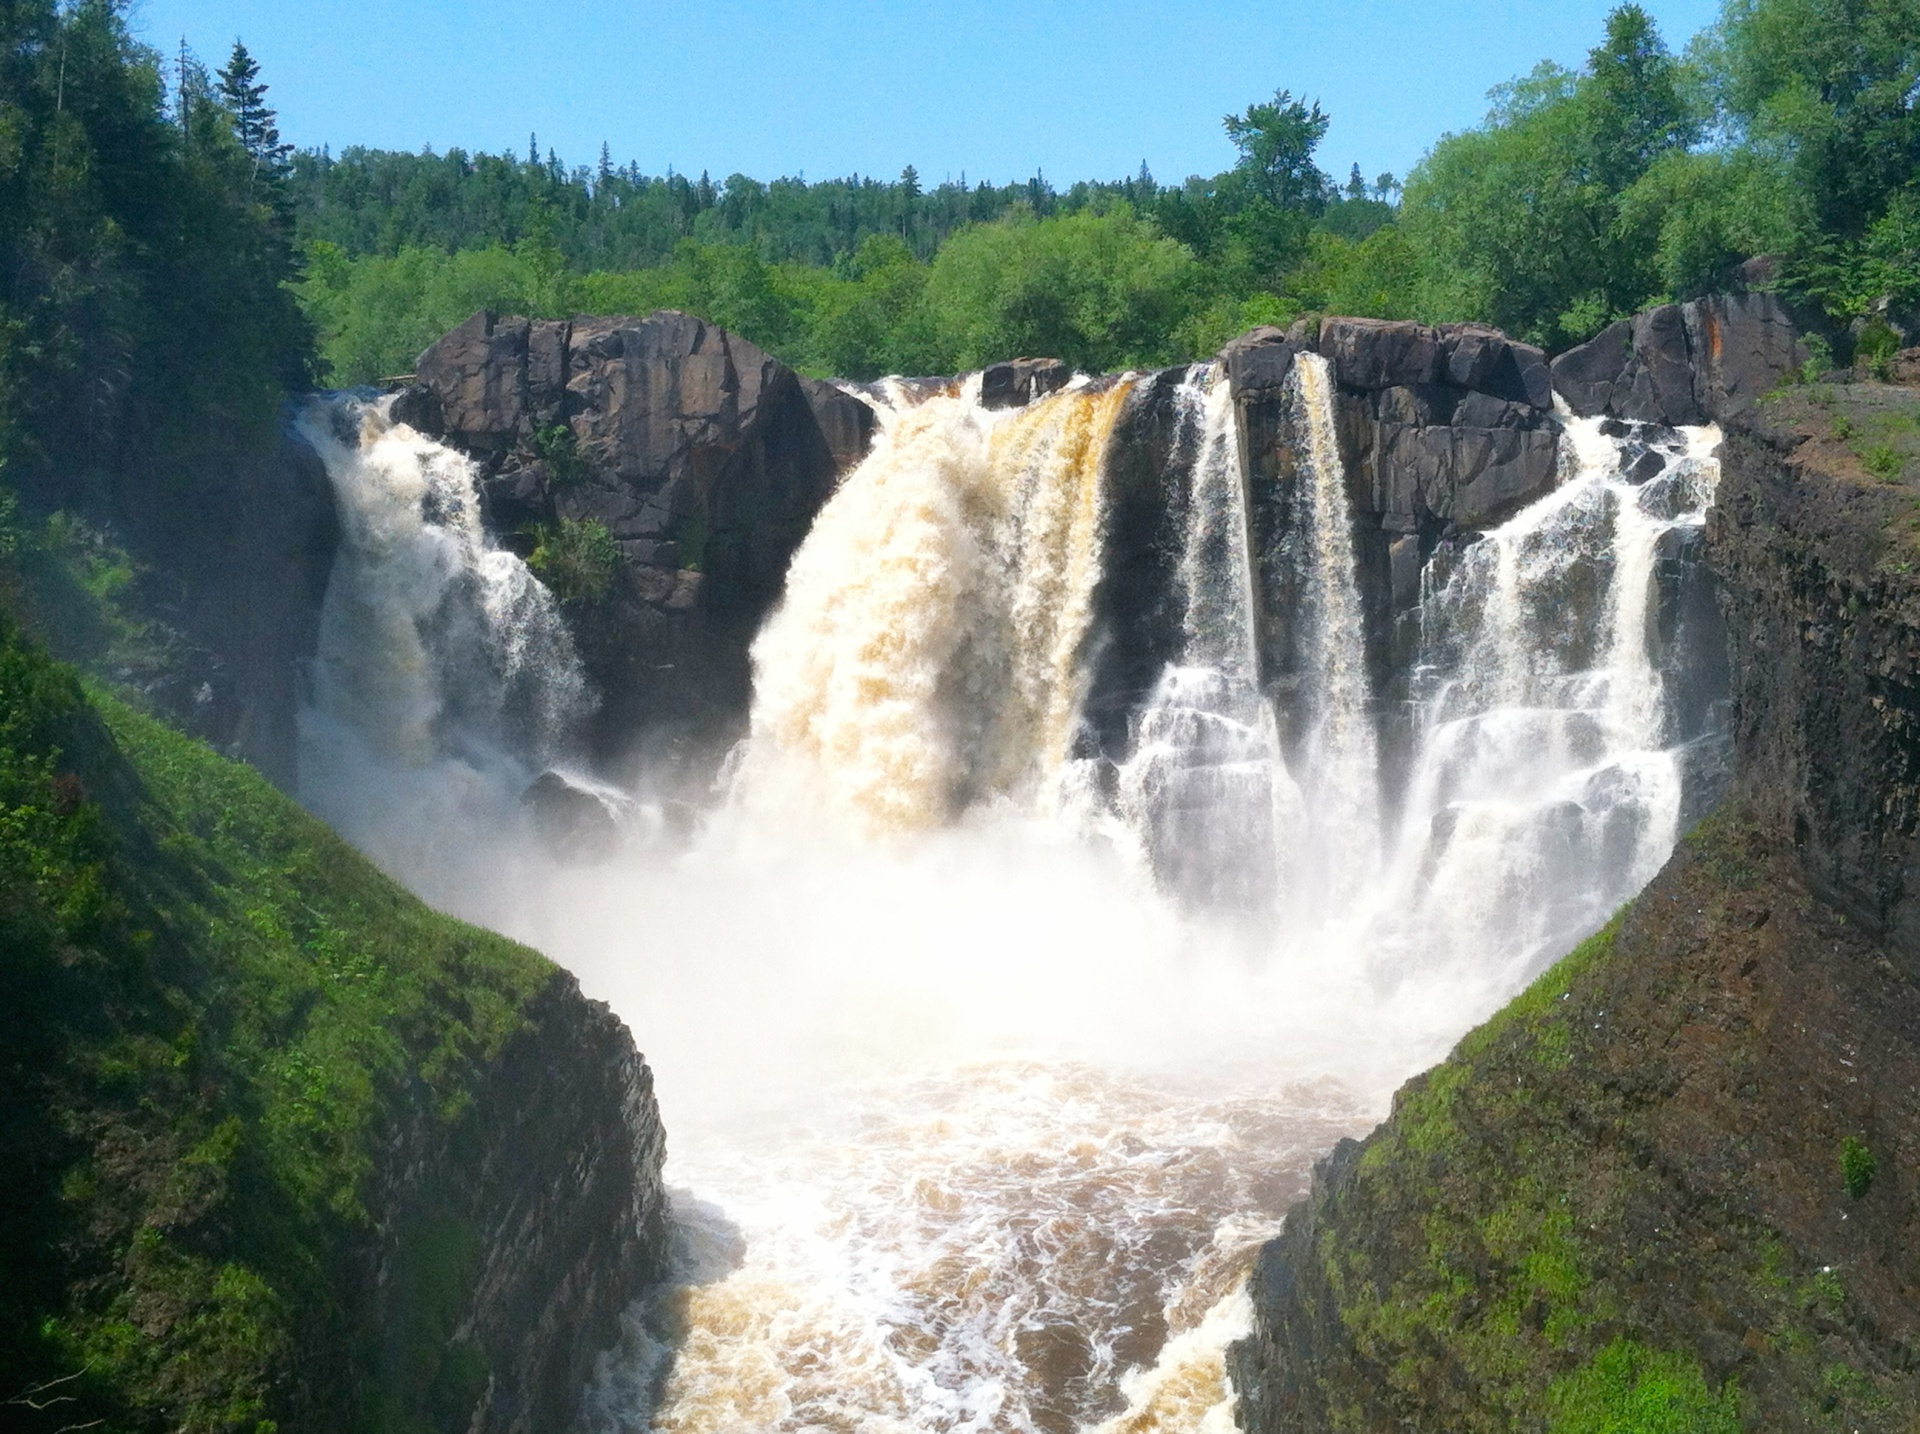 Minnesota State Park Series - Grand Portage